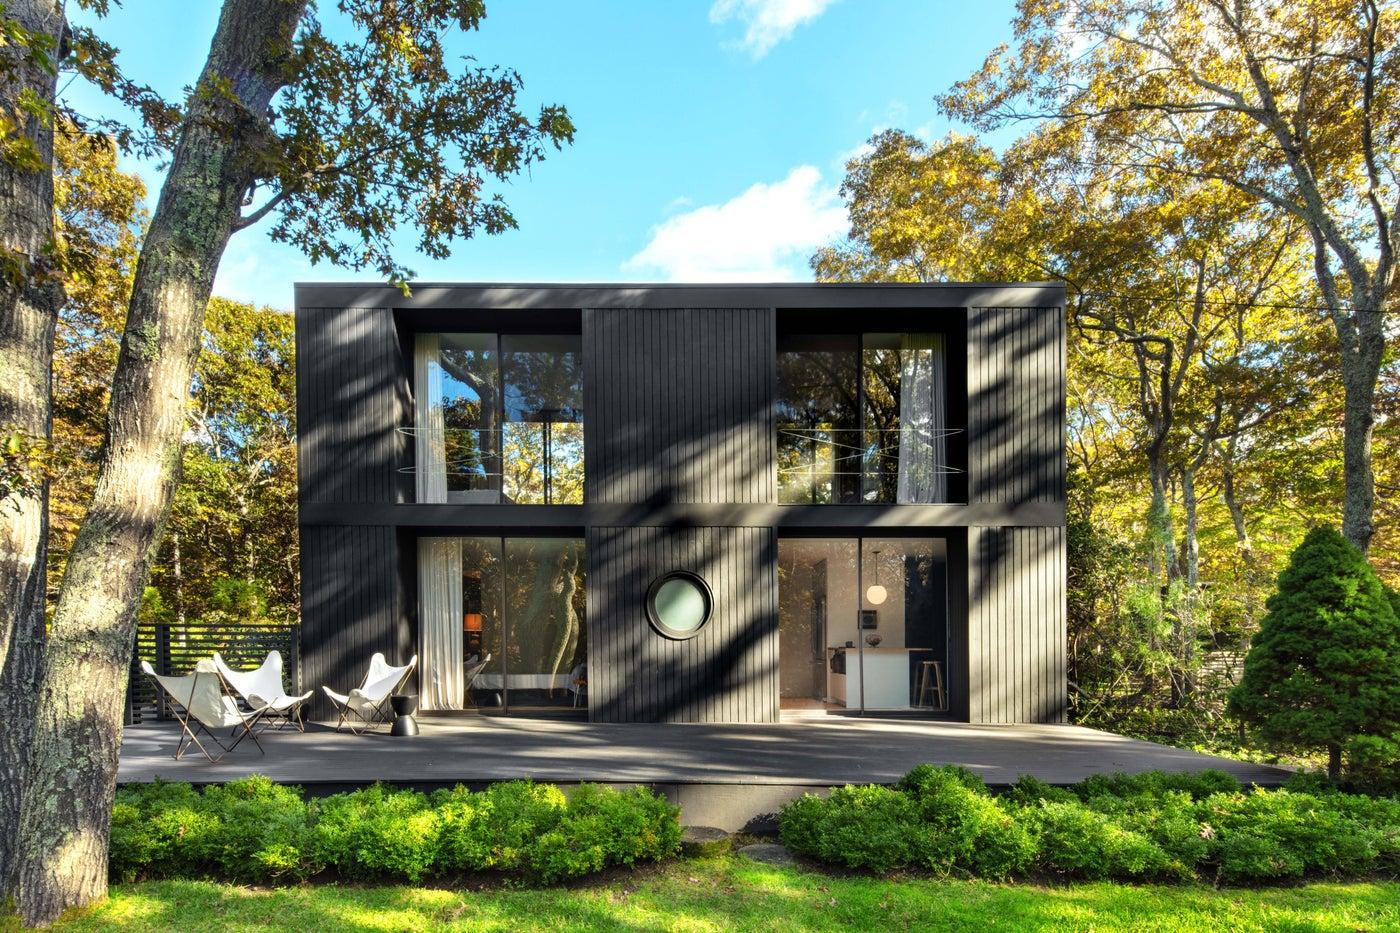 East Hampton Modern home, sleek front facade